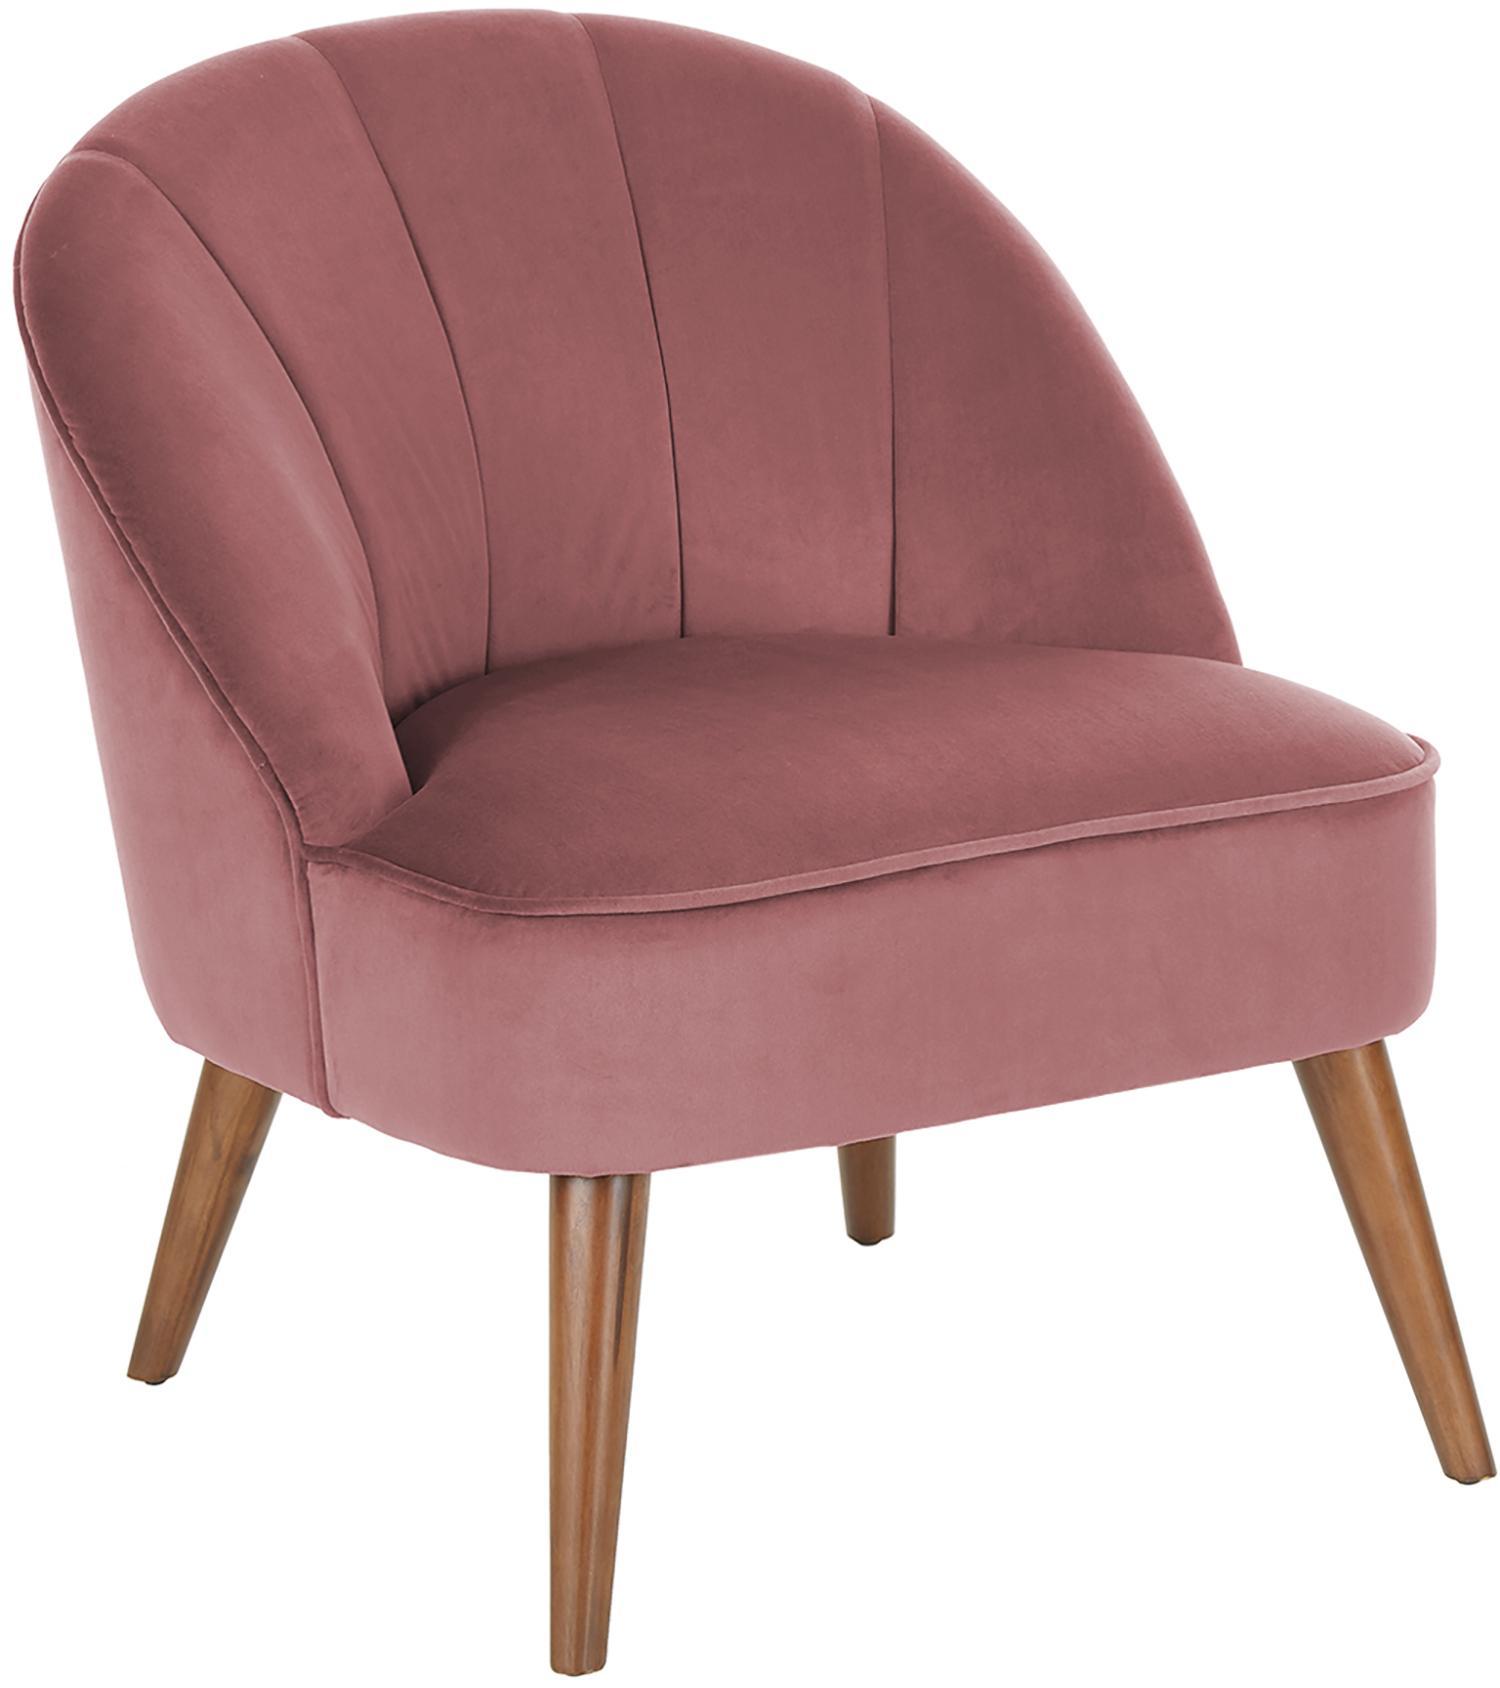 Fluwelen fauteuil Aya, Bekleding: fluweel (polyester), Poten: berkenhout, gelakt, Bekleding: roze. Poten: berkenhoutkleurig, B 73 x D 64 cm